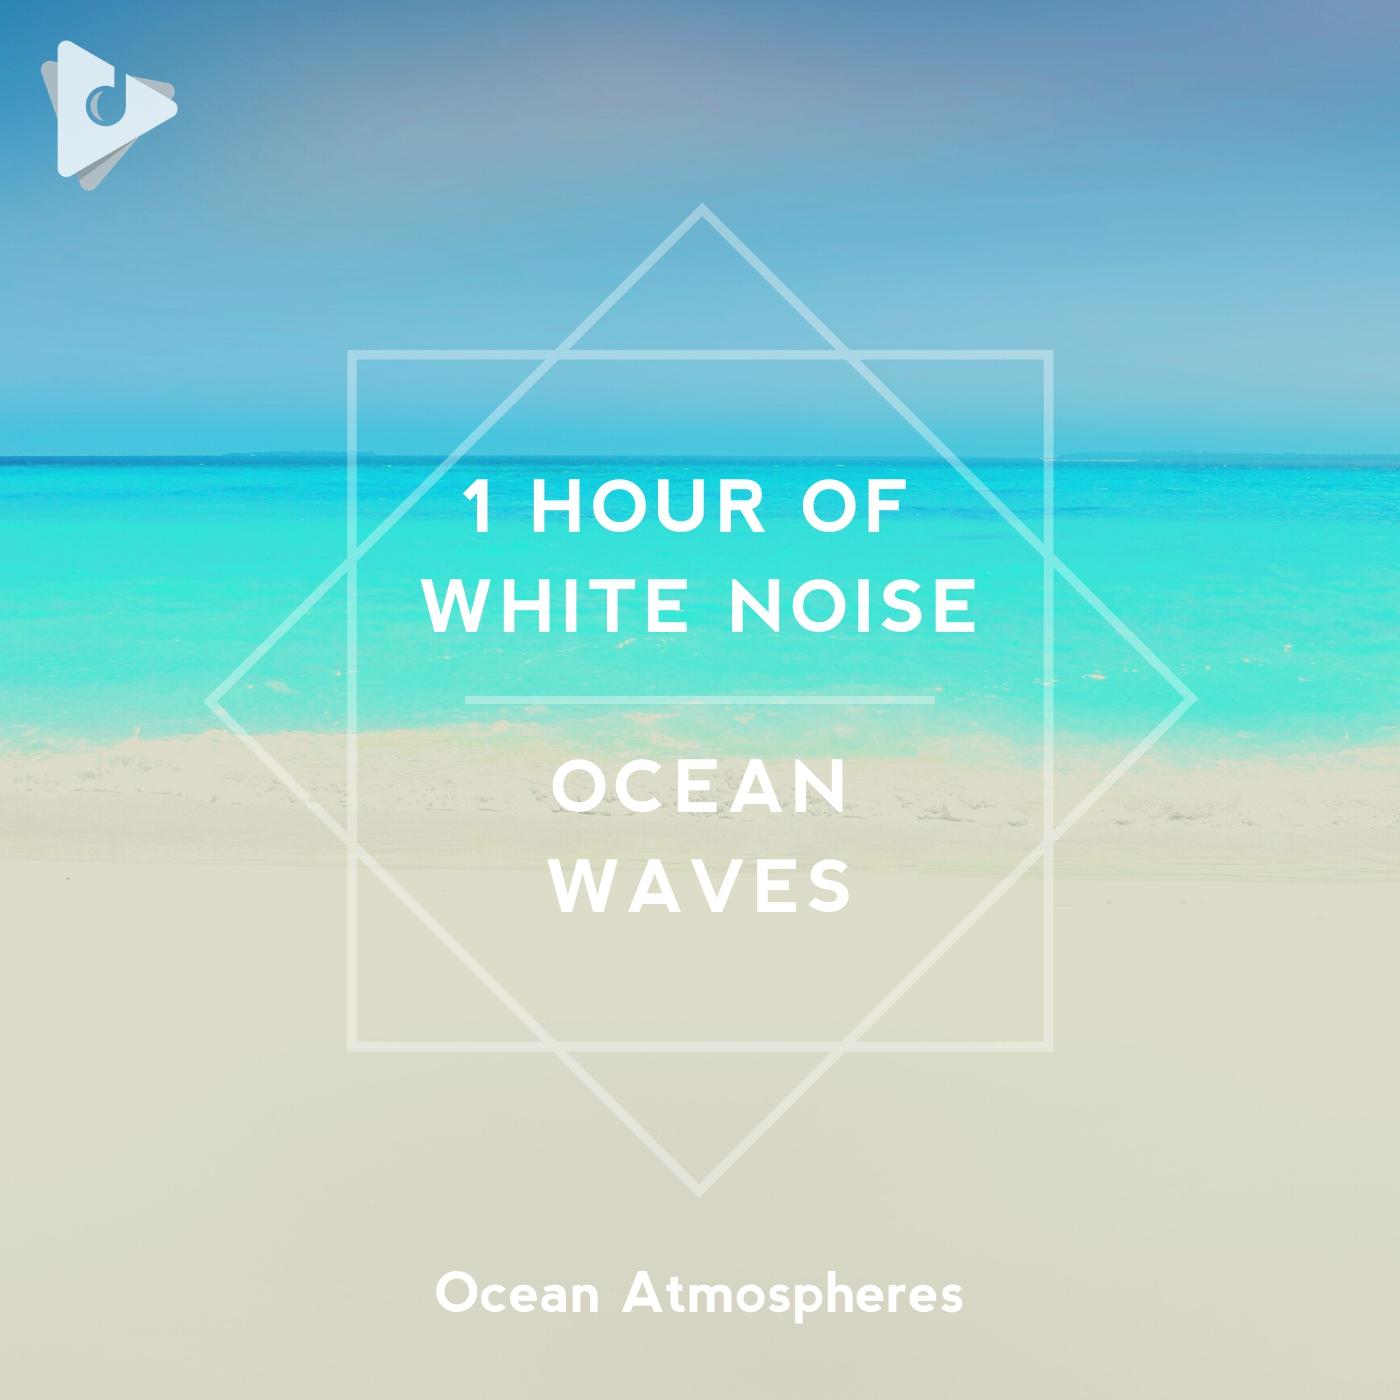 1 Hour of White Noise Ocean Waves